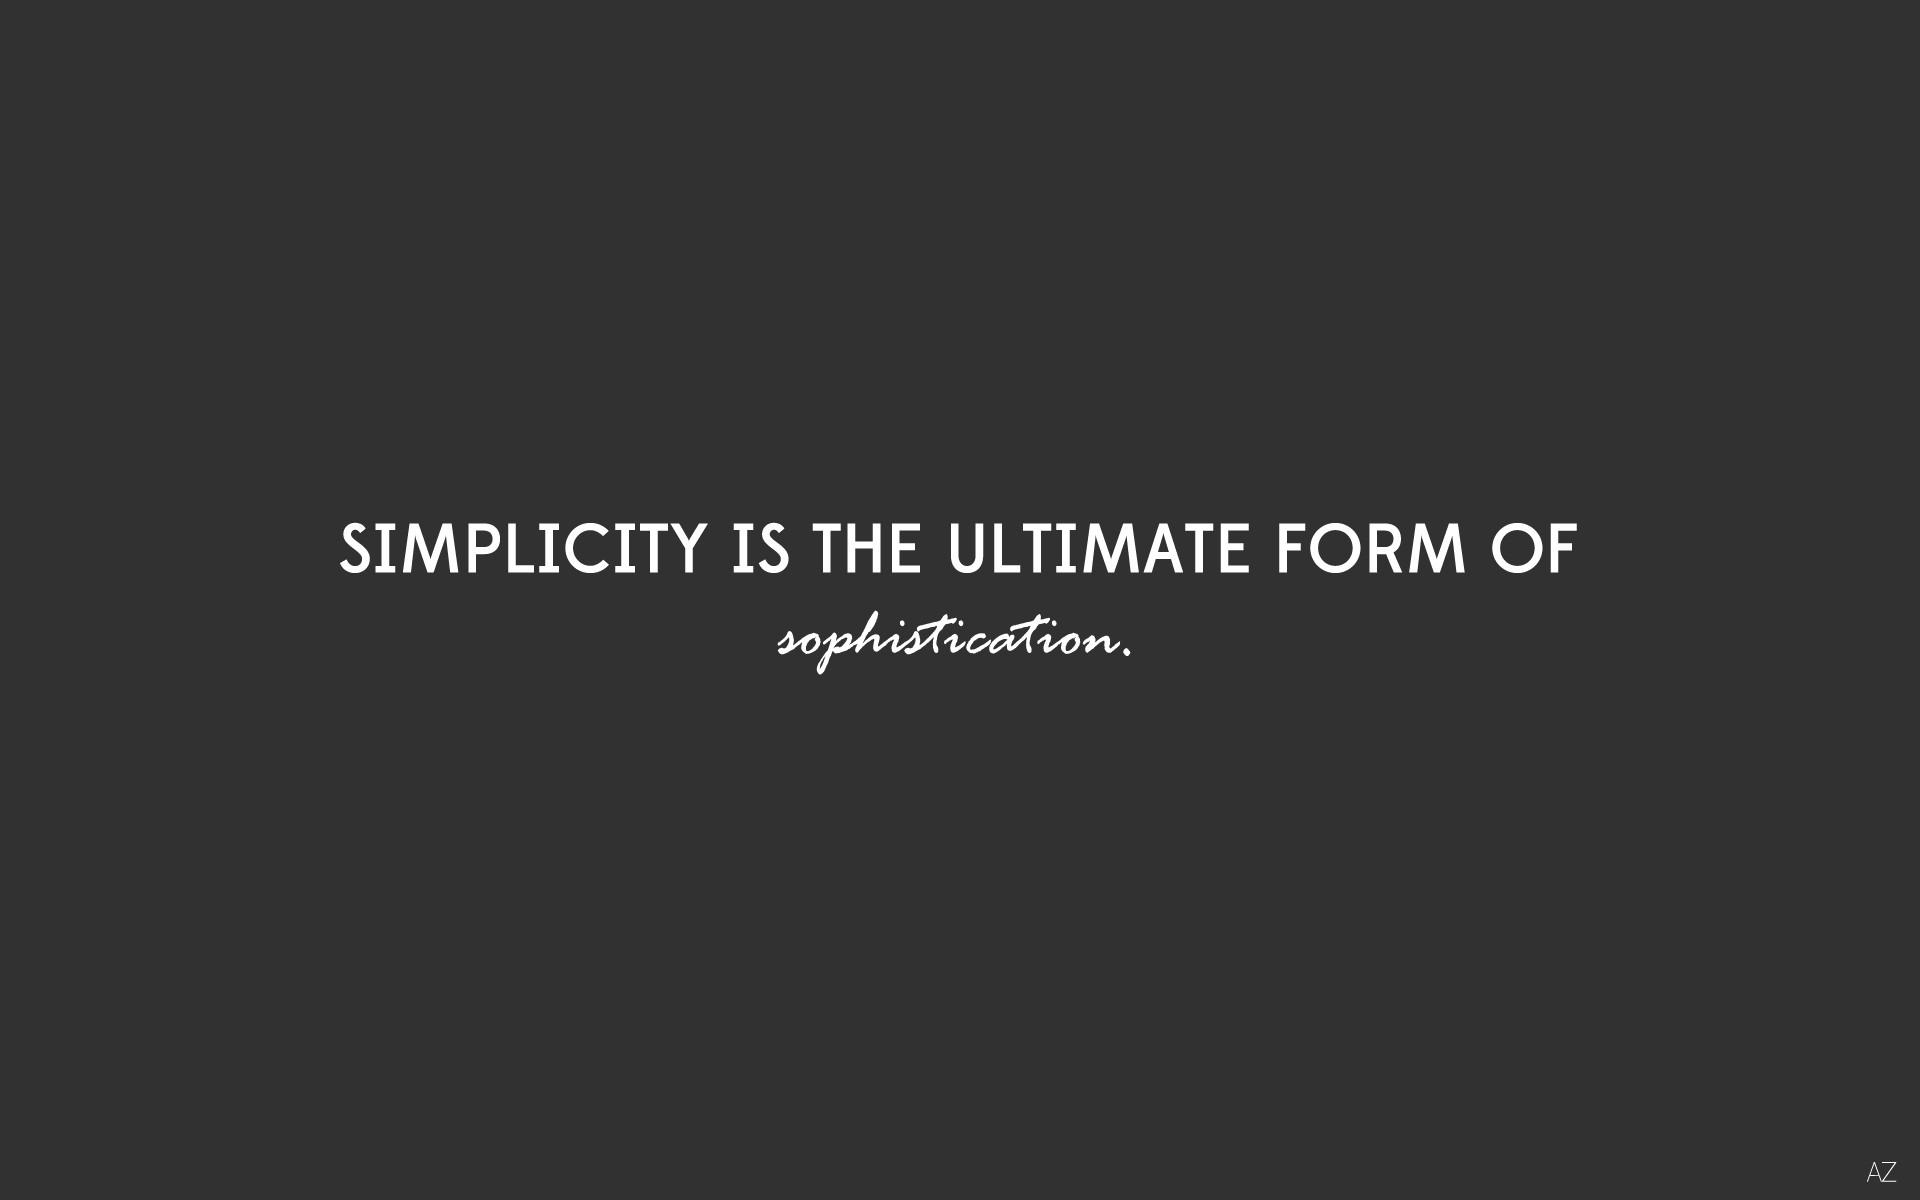 Quotes Desing simplicity sophistication wallpaper ...  Simplicity Wallpaper